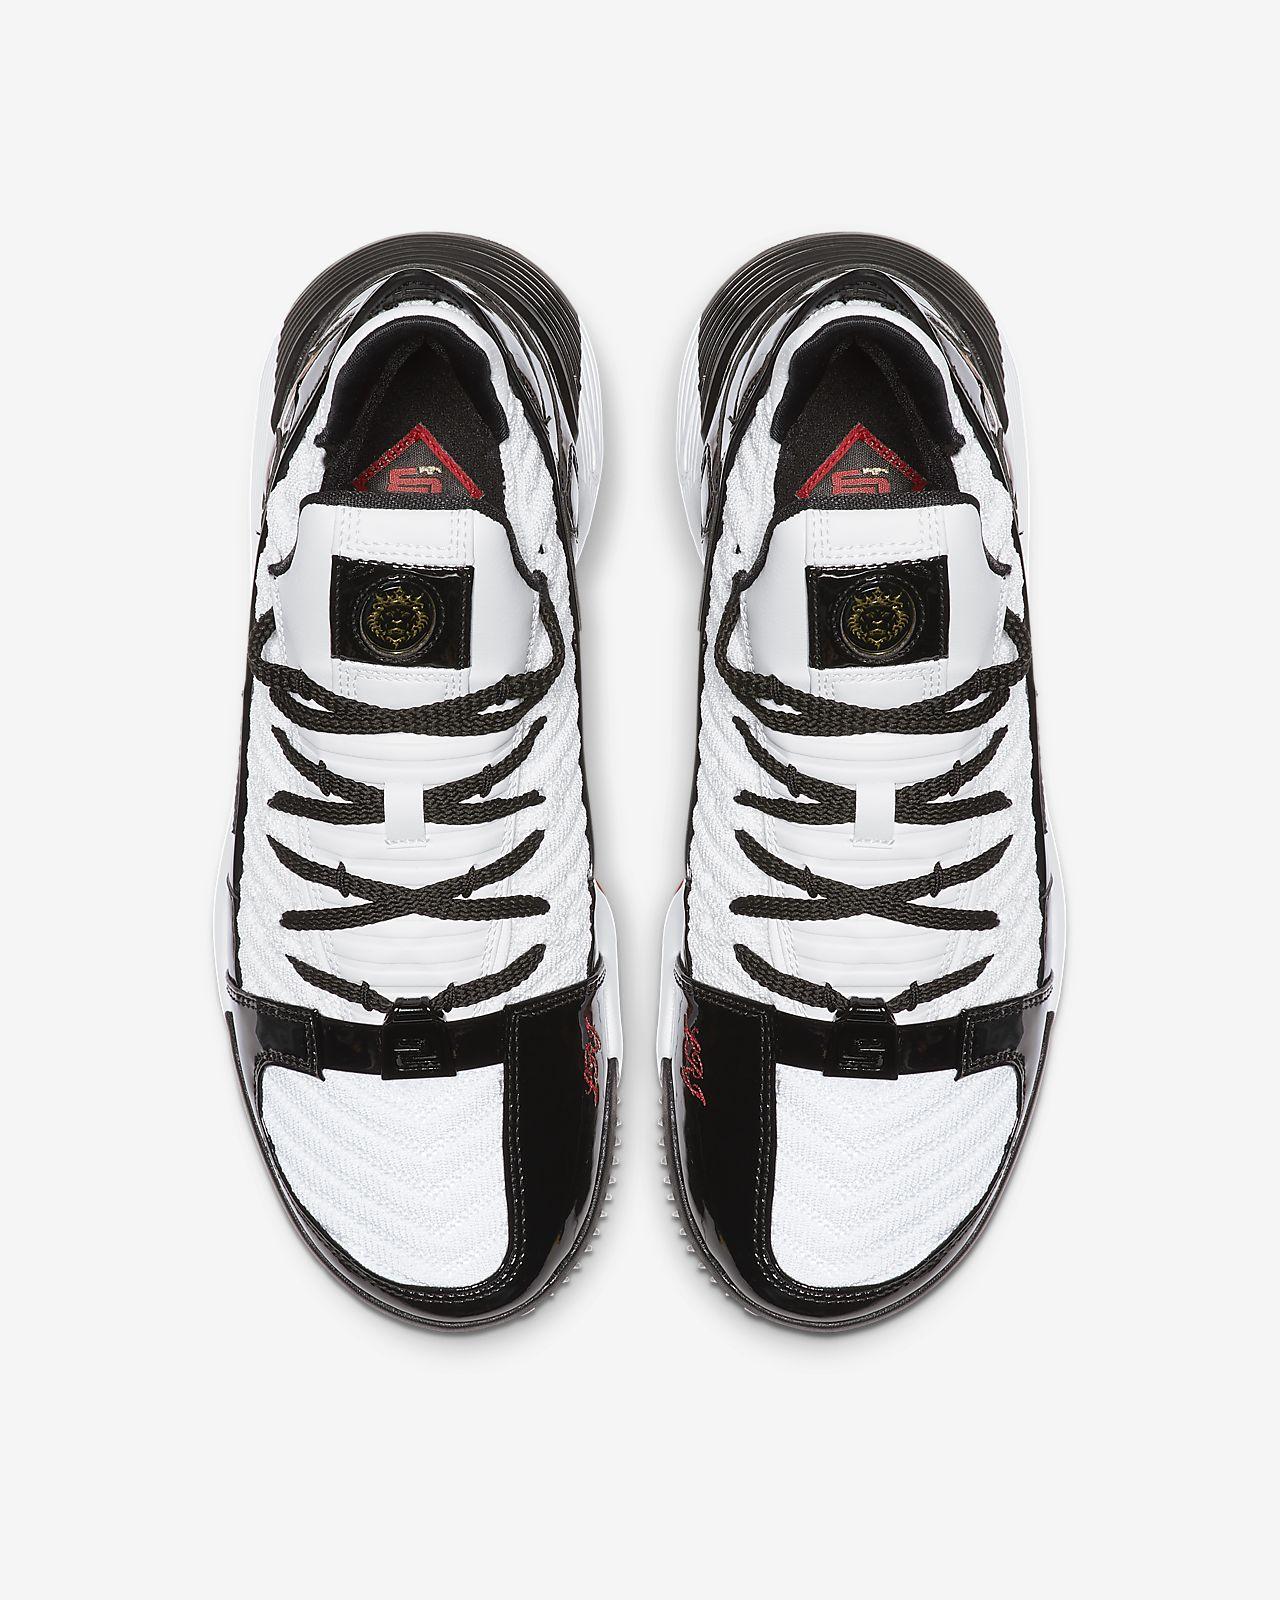 657df577b6d4 Basketbalová bota LeBron XVI Remix. Nike.com CZ